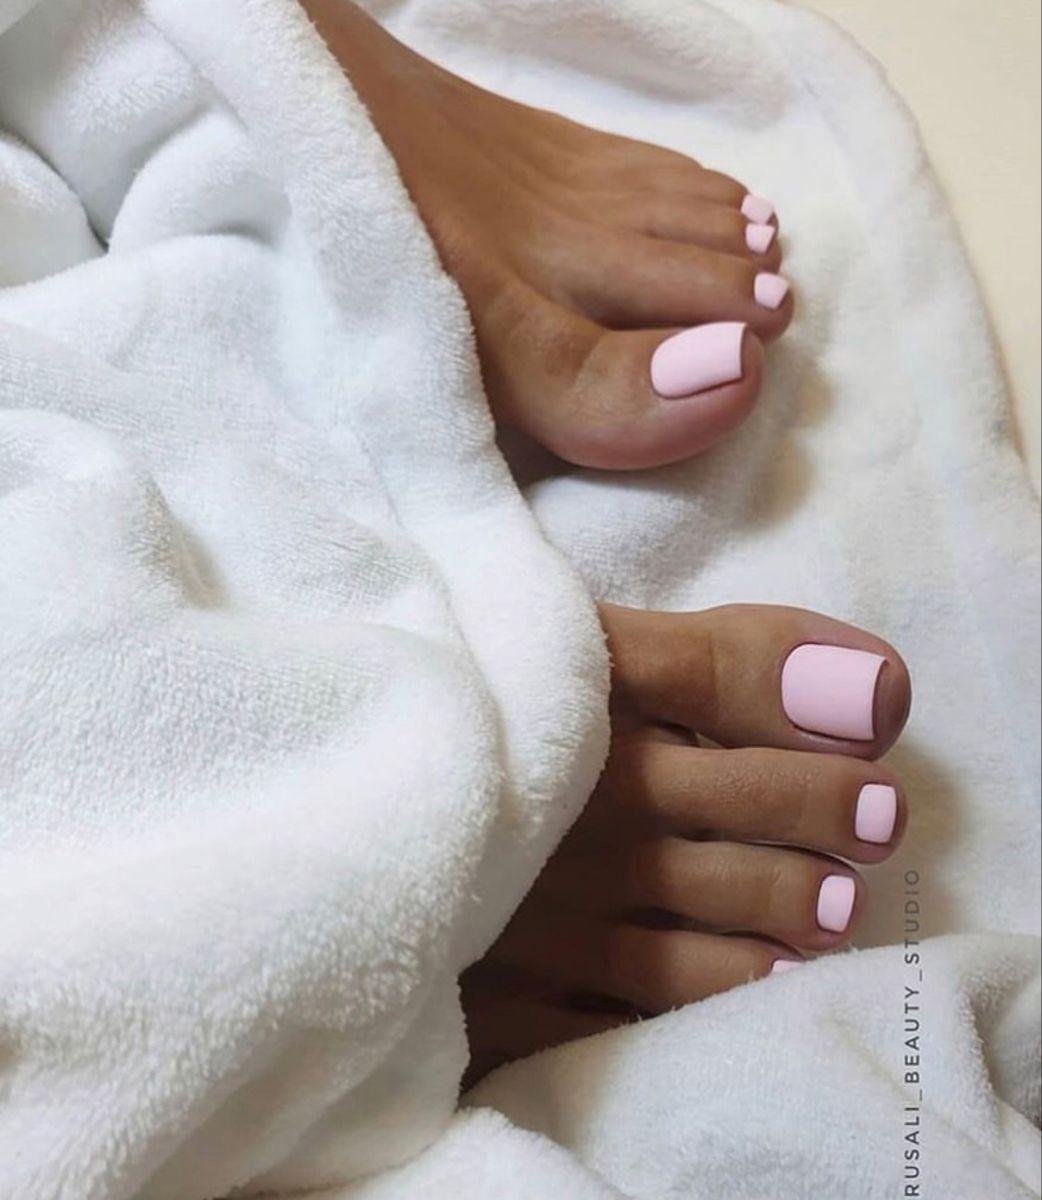 15 Top Winter Nail Colors 2019 – Festive Winter Nail Polish Ideas 2020